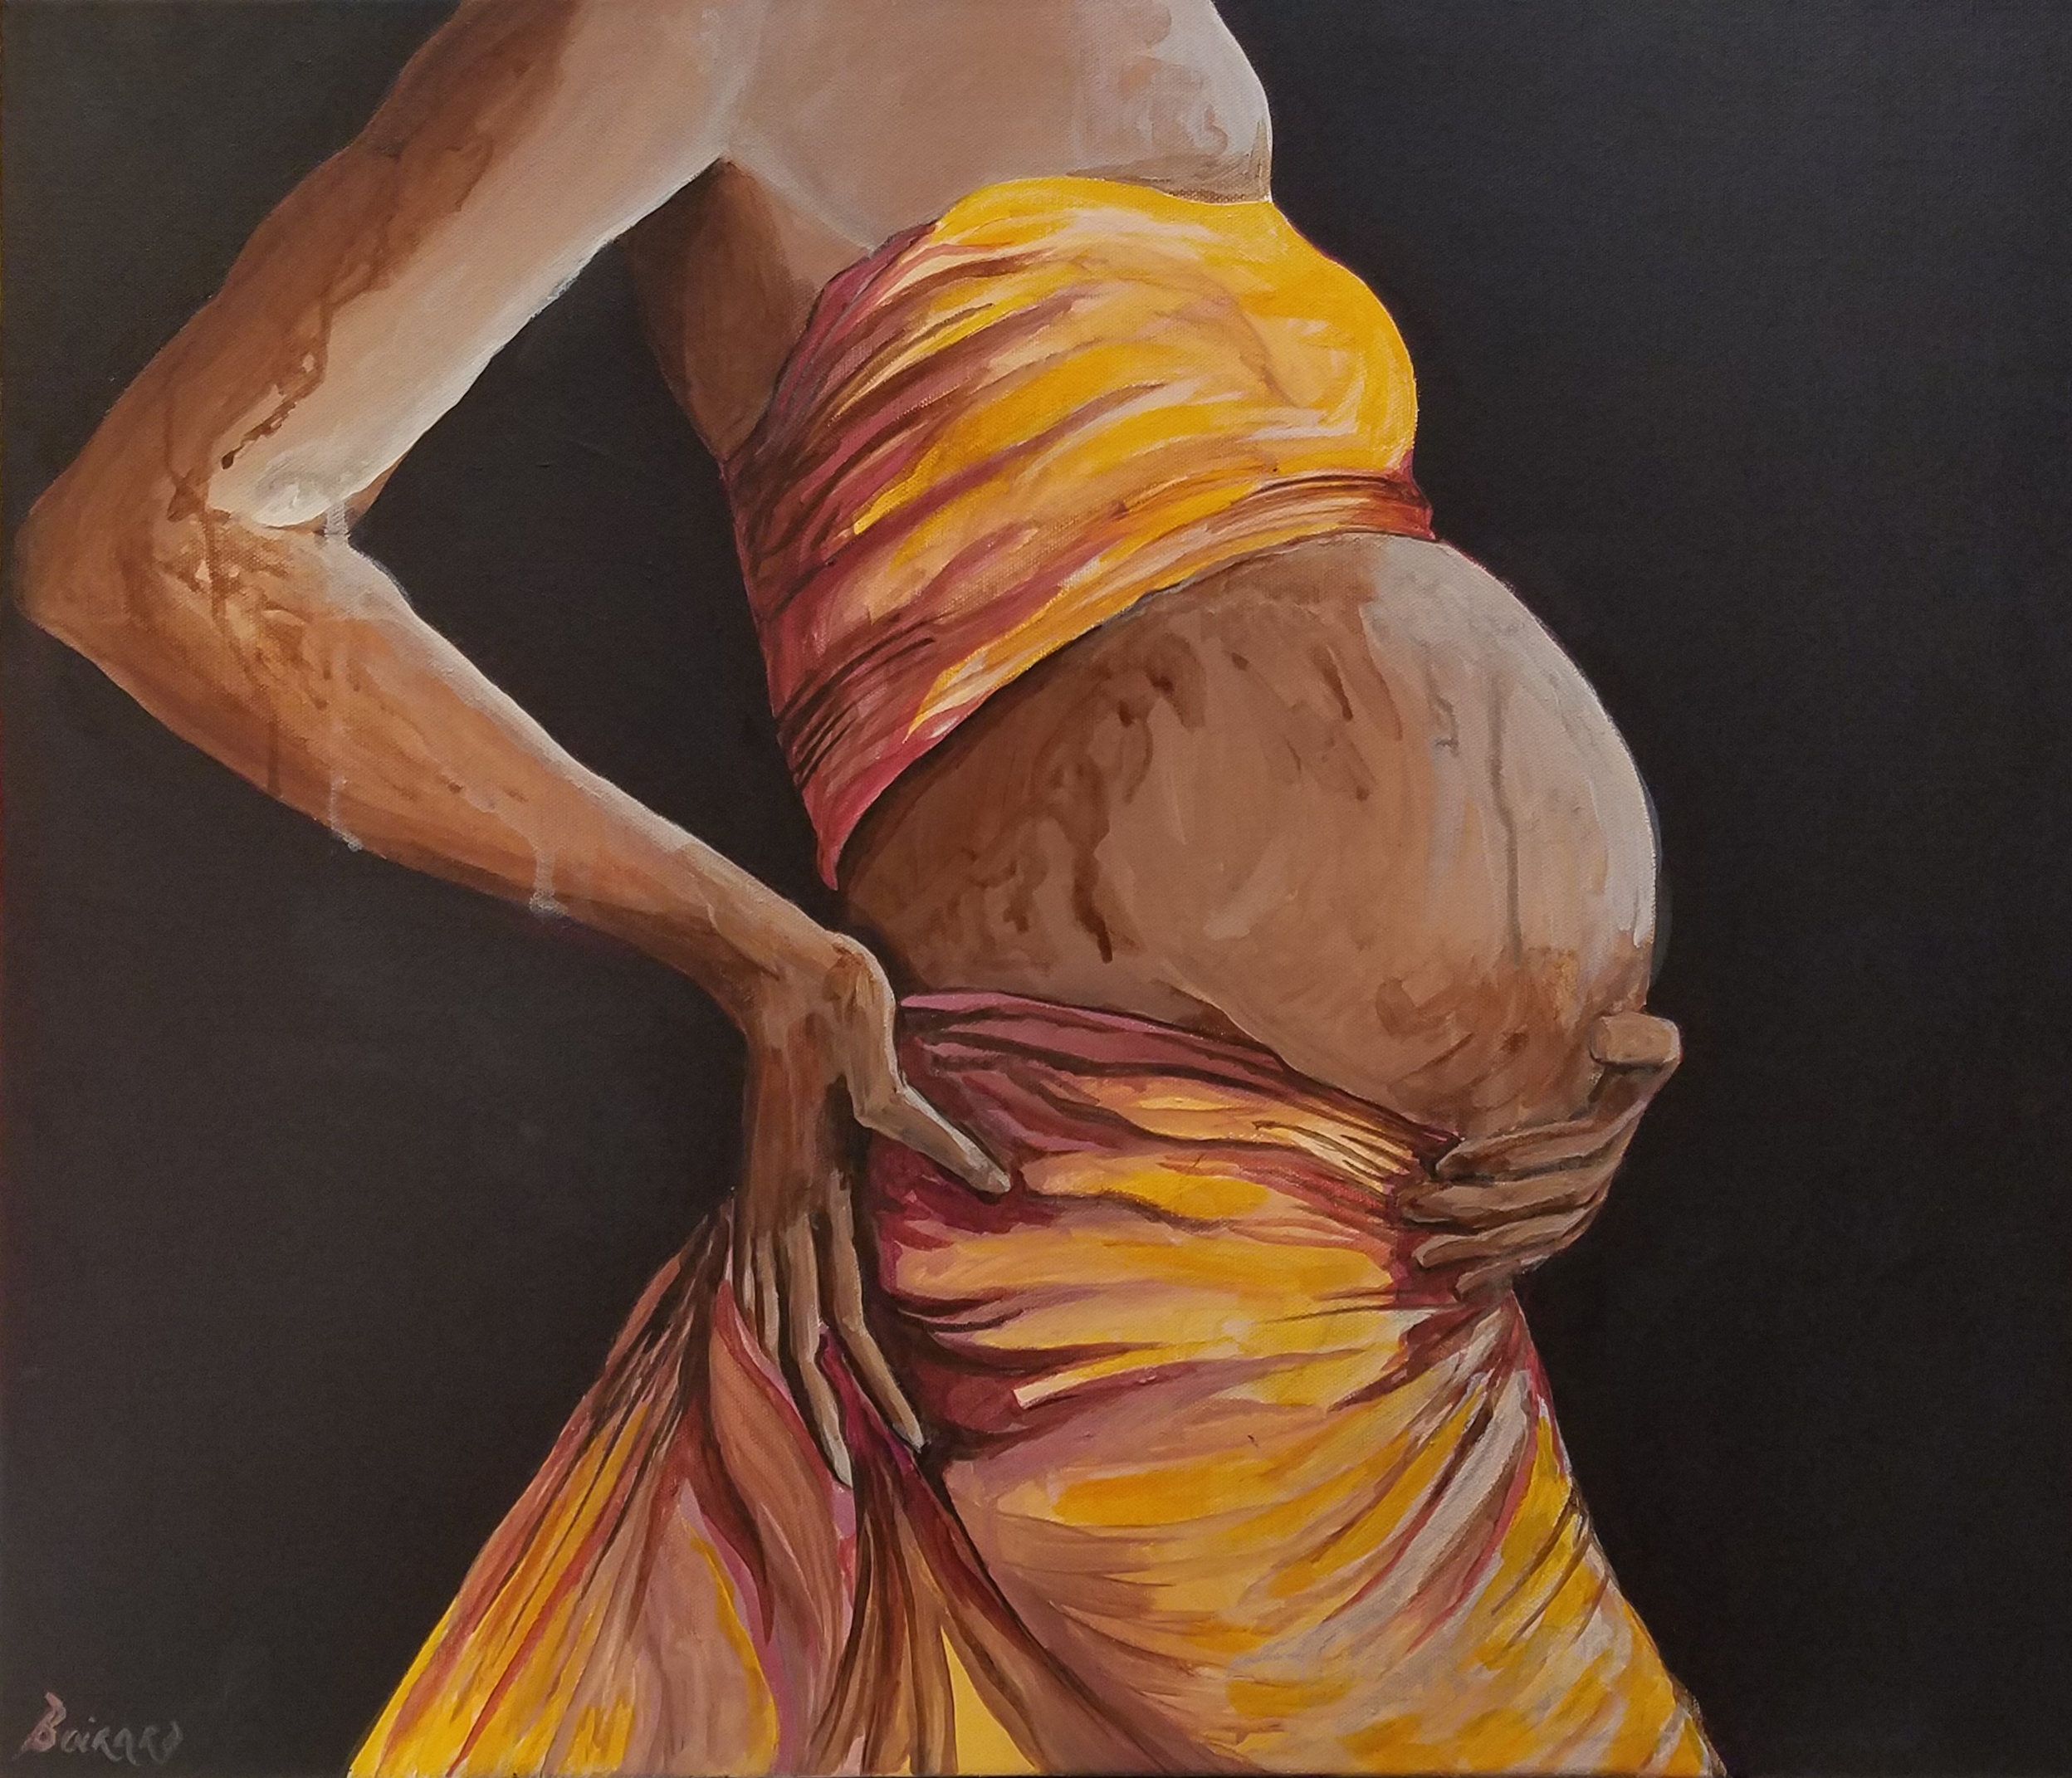 GalleryAWA-Tara Boirard-Espwa.jpg